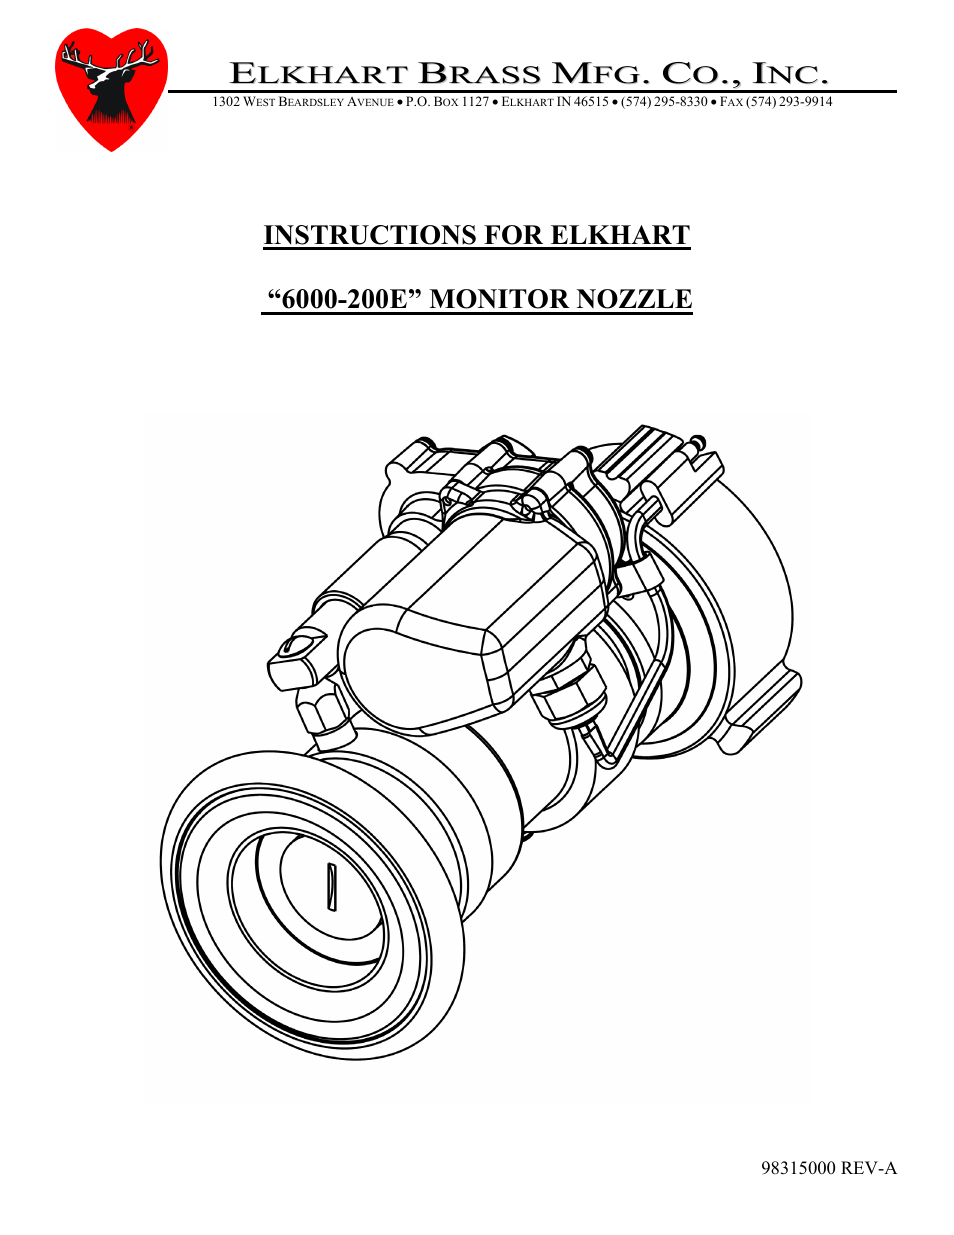 Elkhart Brass ELKHART 6000-200E MONITOR NOZZLE User Manual